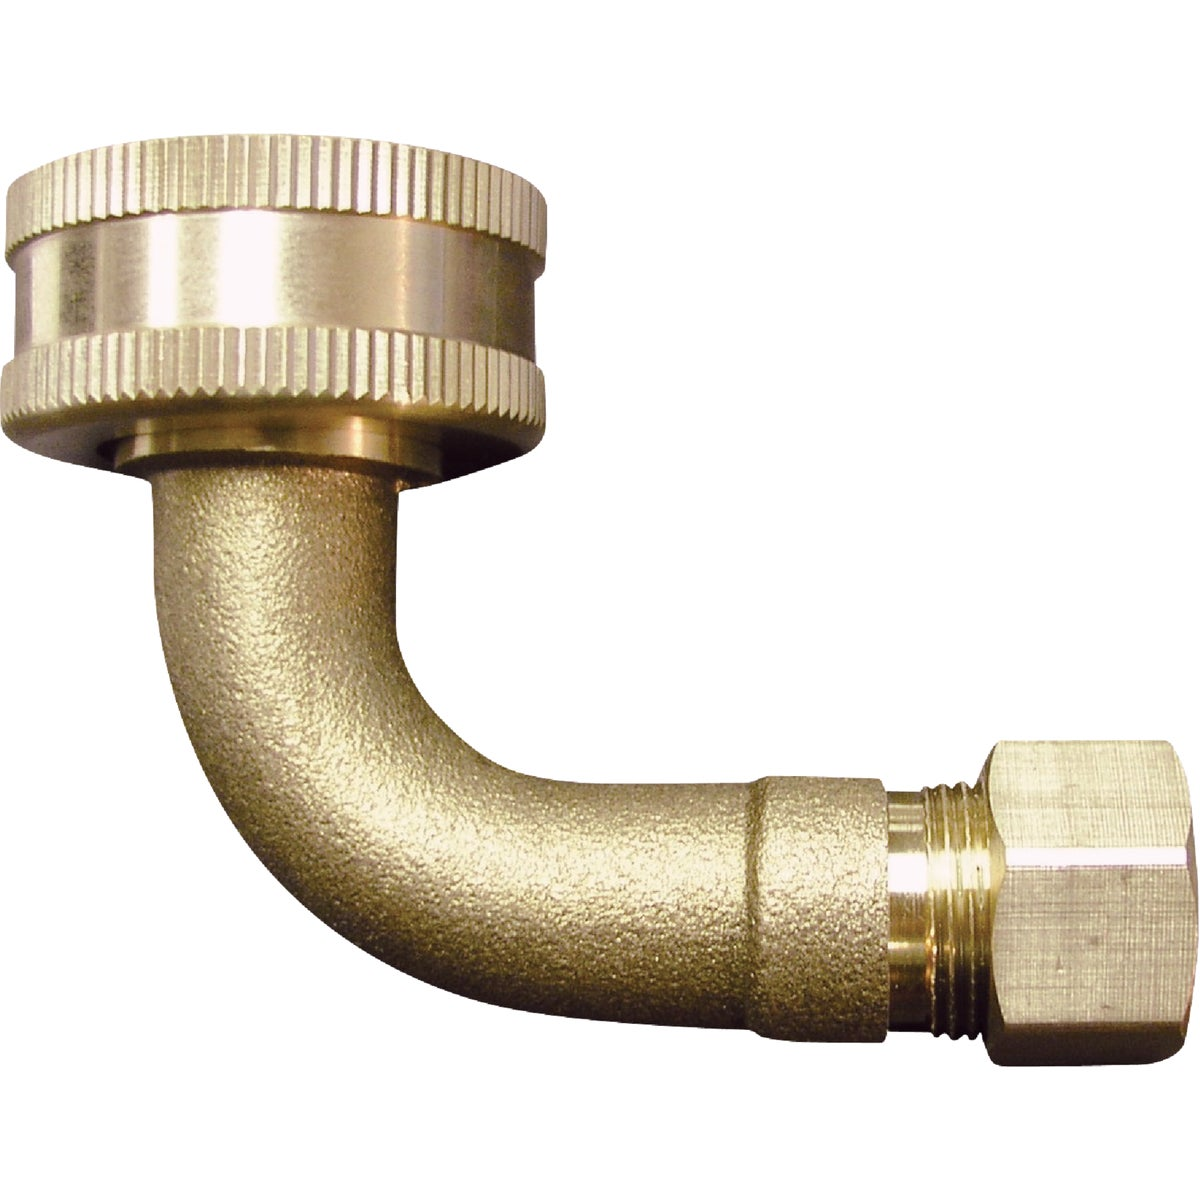 Watts Water Technologies 3/4GHX3/8 DISHWSHR ELBOW A-158A